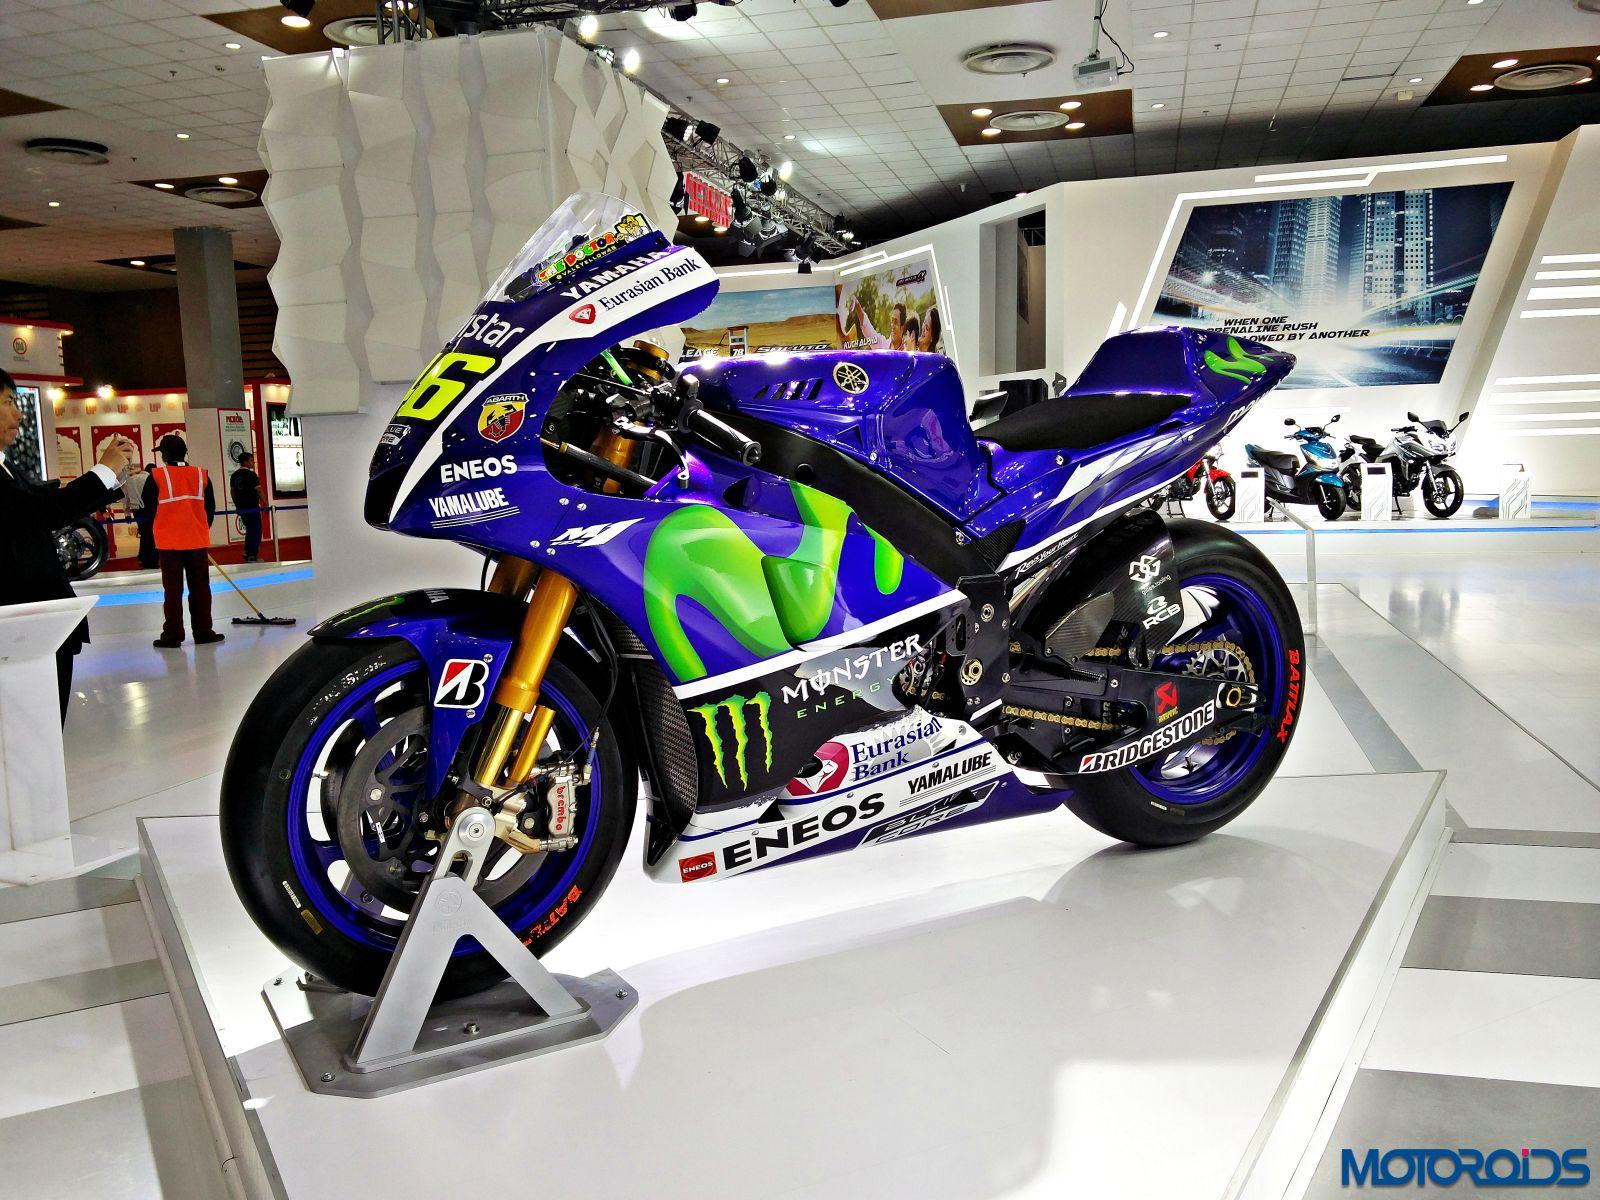 Yamaha M1 - MotoGP Motorcycle - Auto Expo 2016 (10)